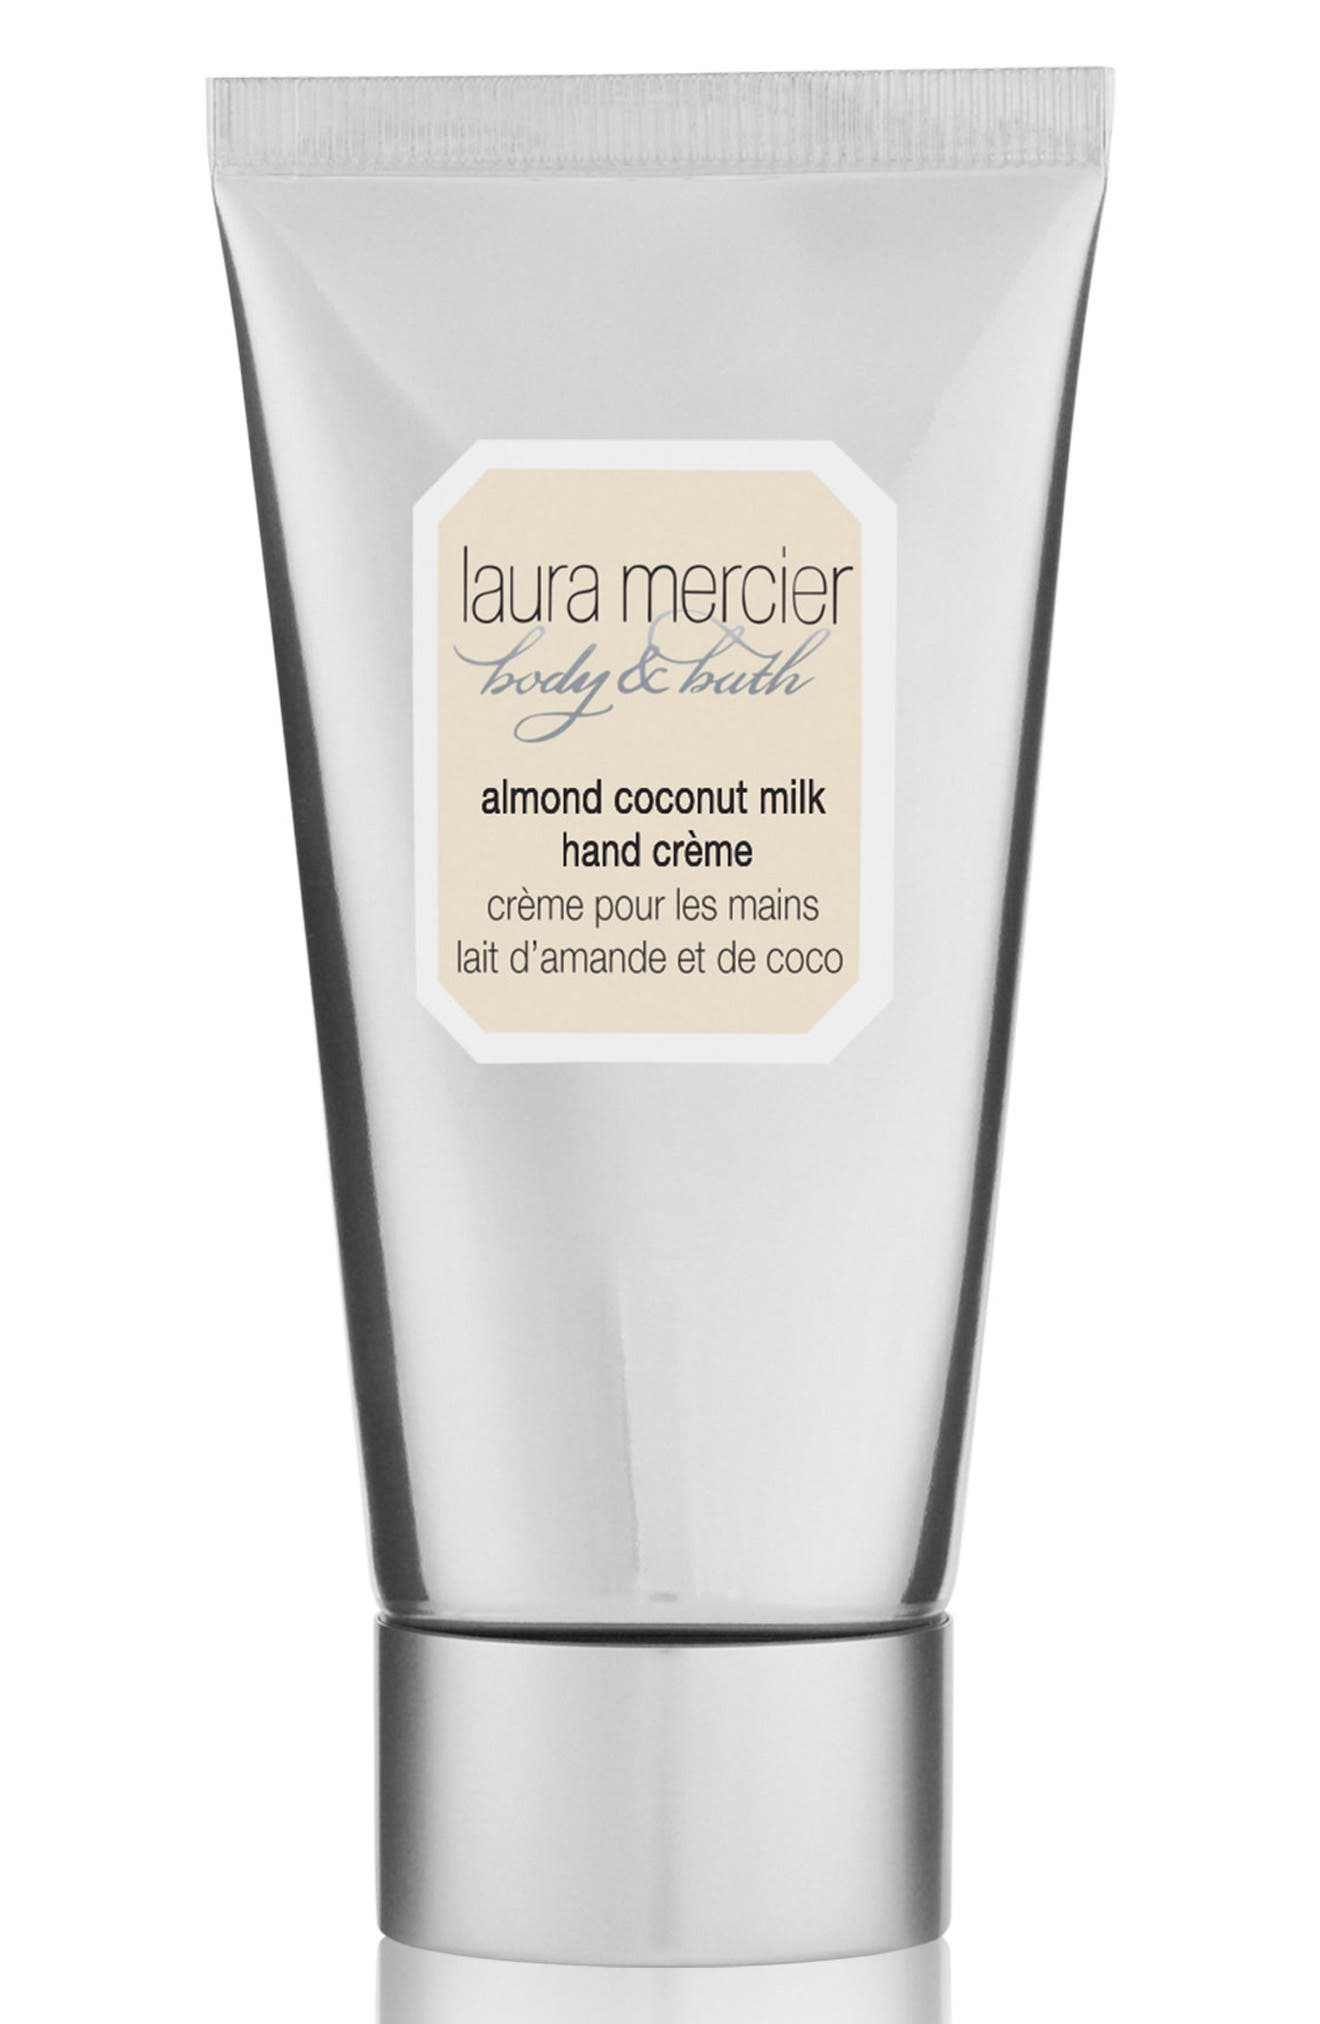 Almond Coconut Milk Hand Creme